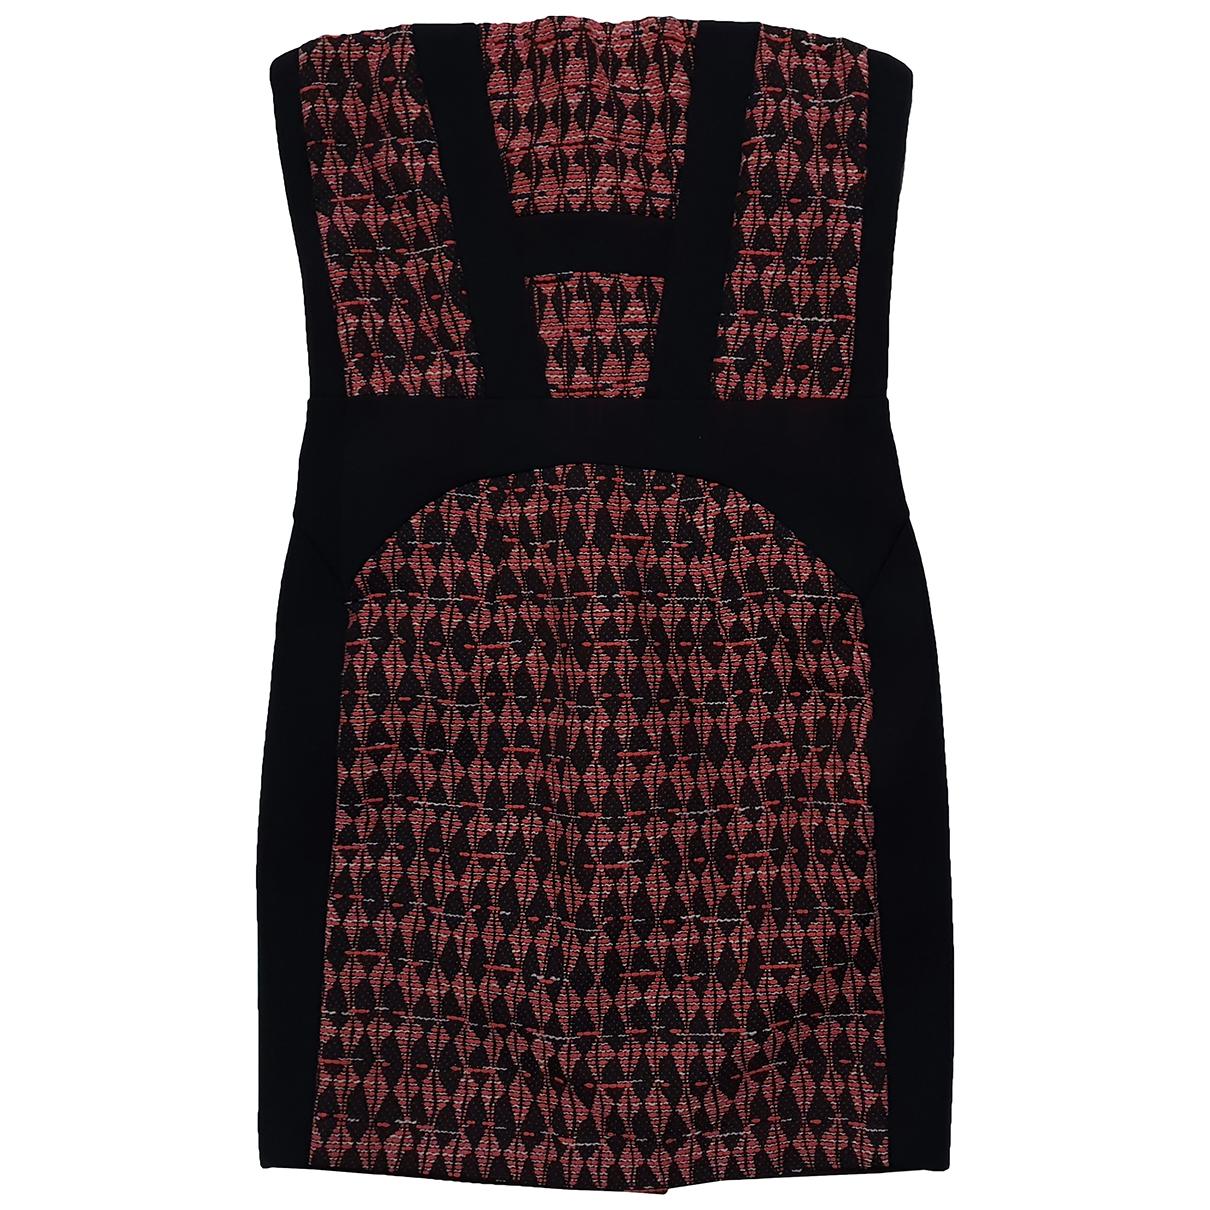 Maje Spring Summer 2019 Multicolour Cotton dress for Women 38 FR